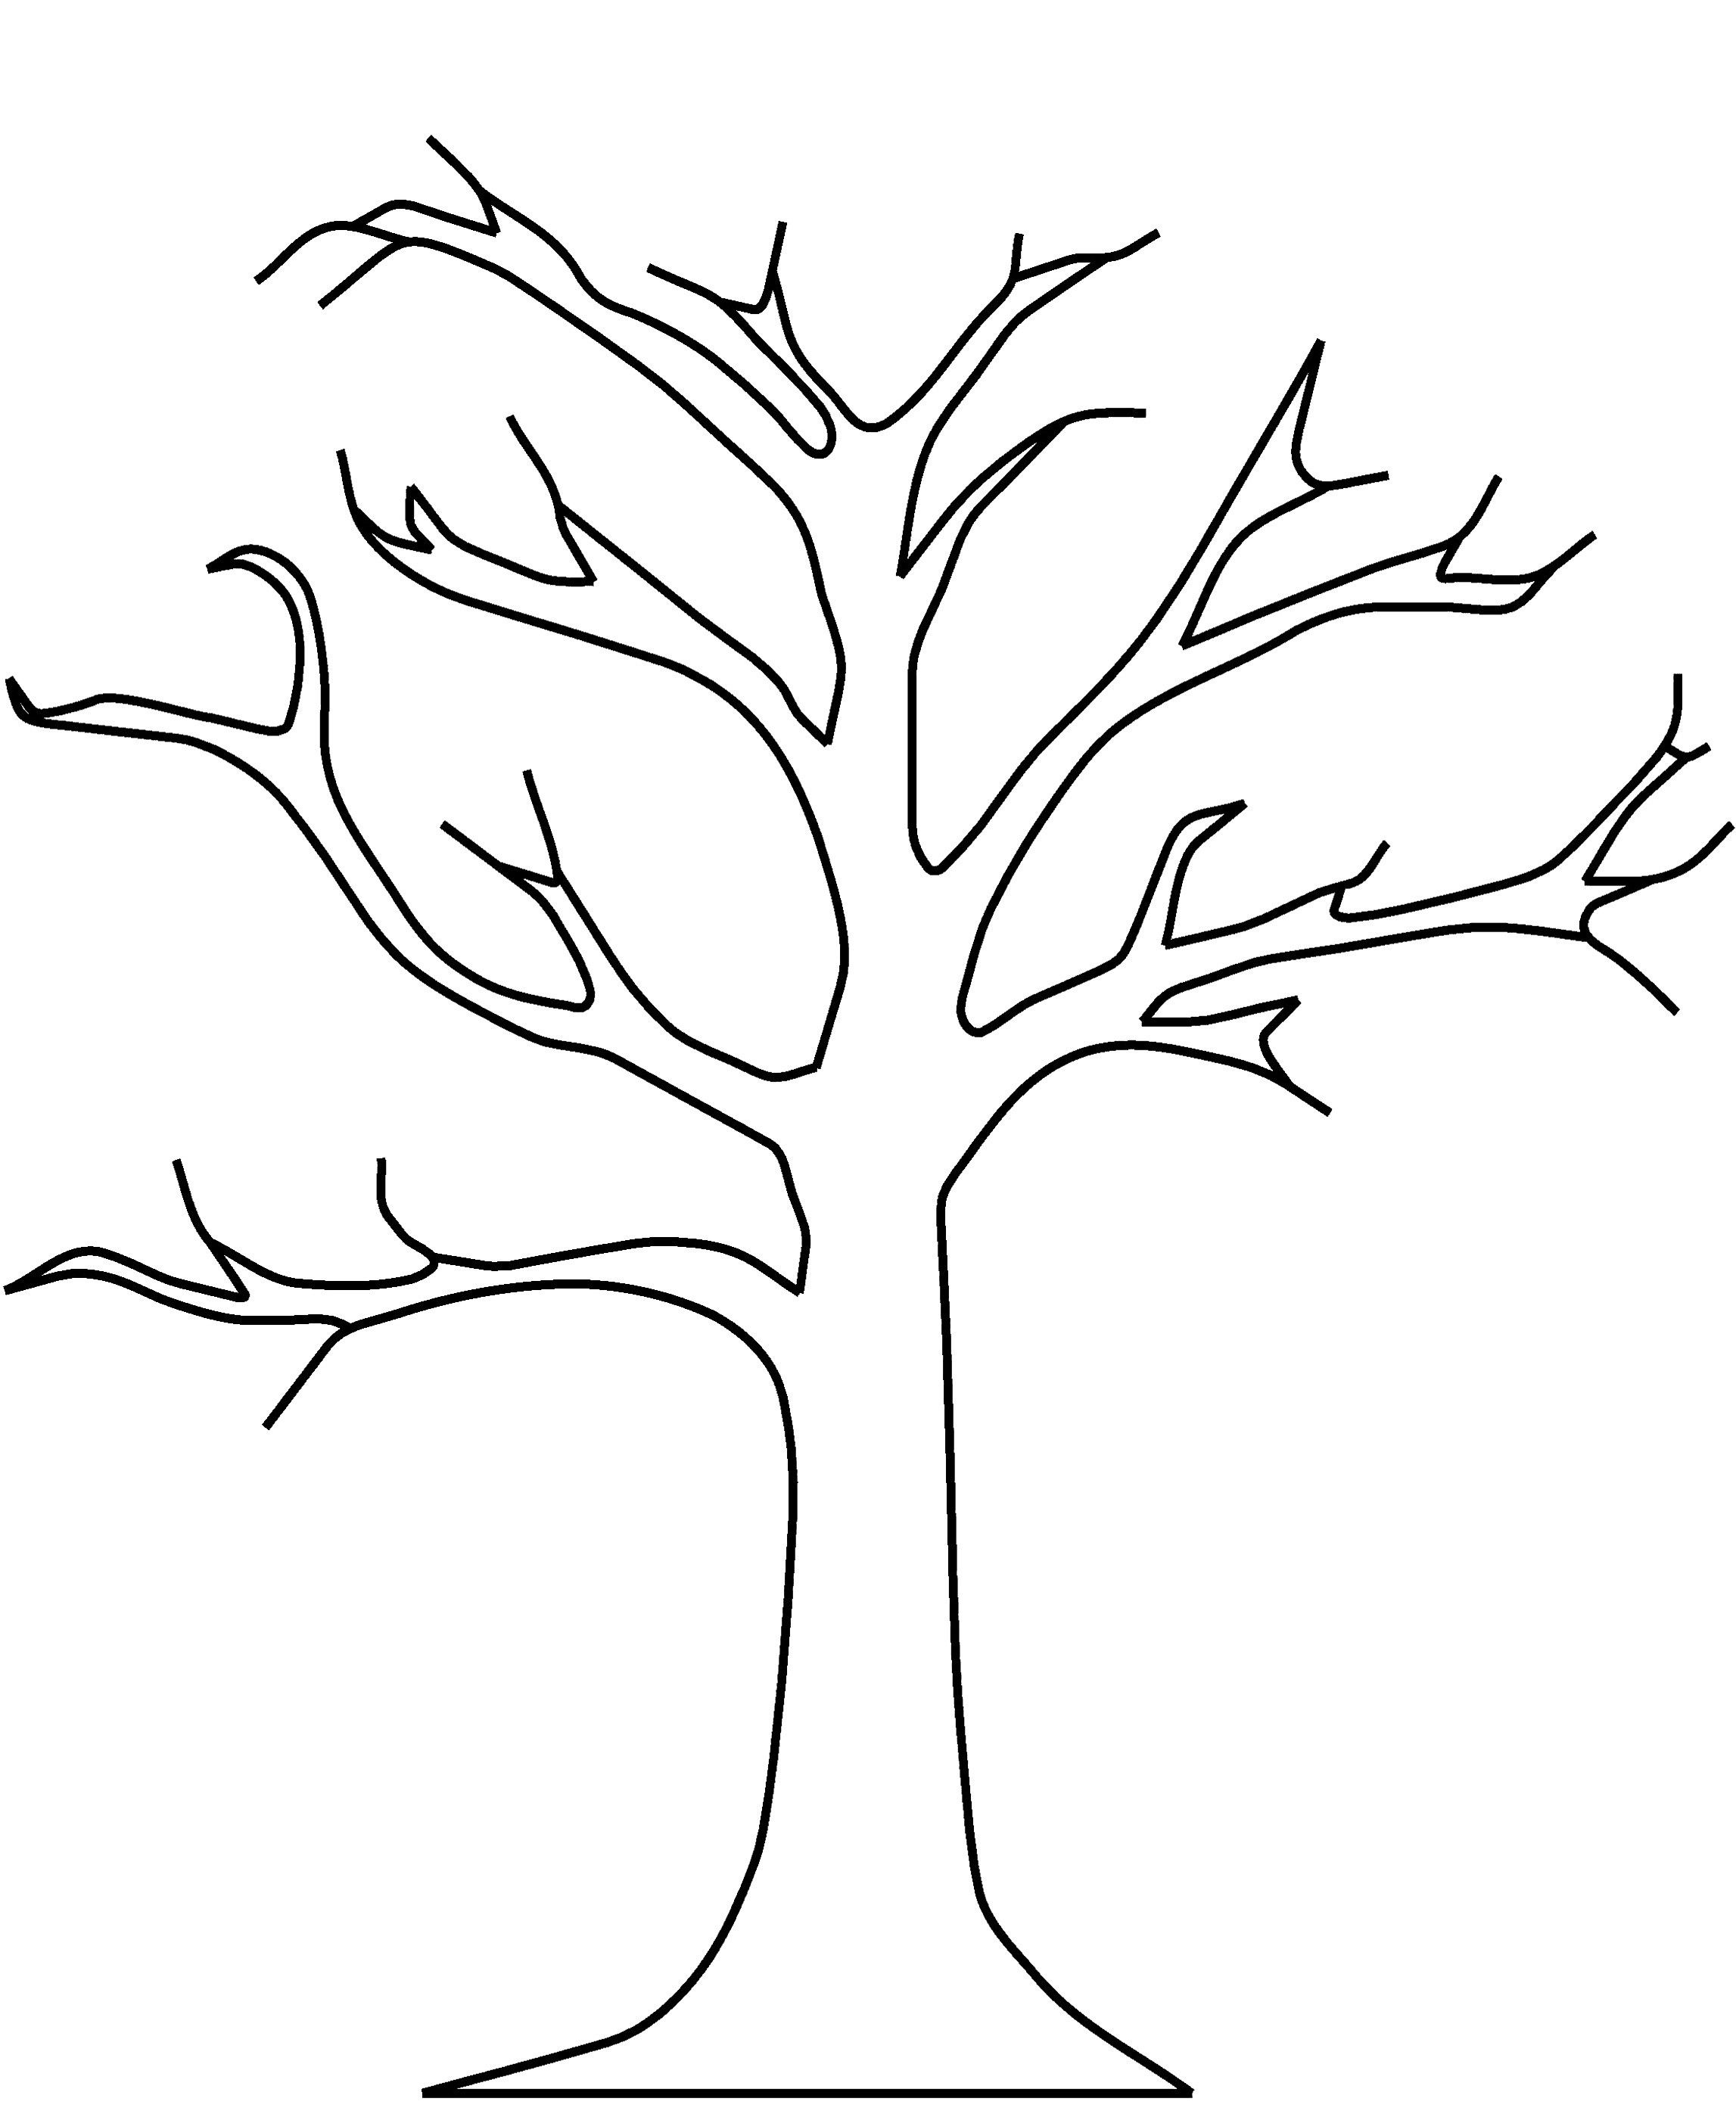 Malvorlage Baum Kostenlos 01 art simple drawings   Tree ...